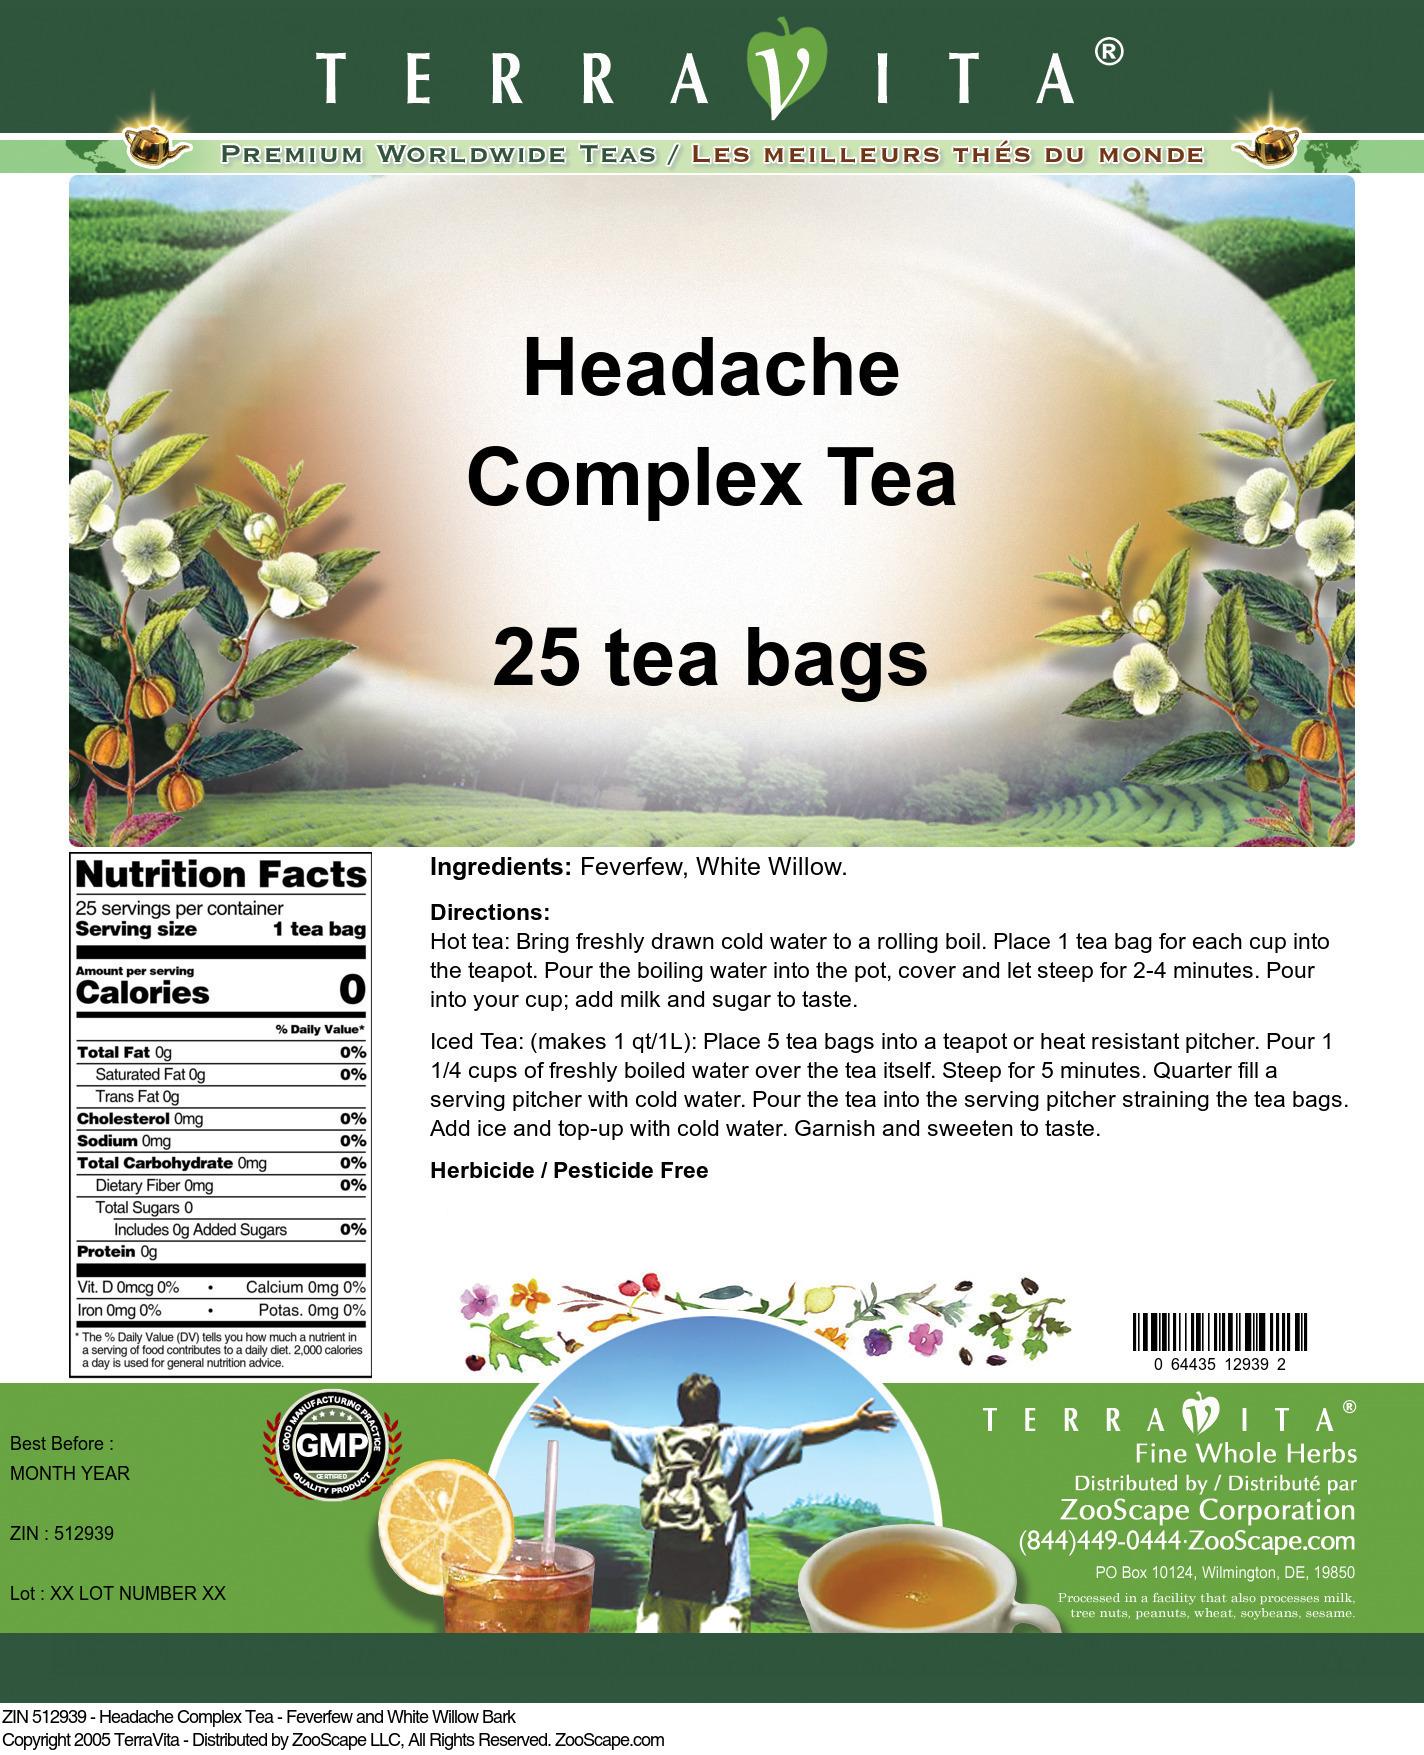 Headache Complex Tea - Feverfew and White Willow Bark